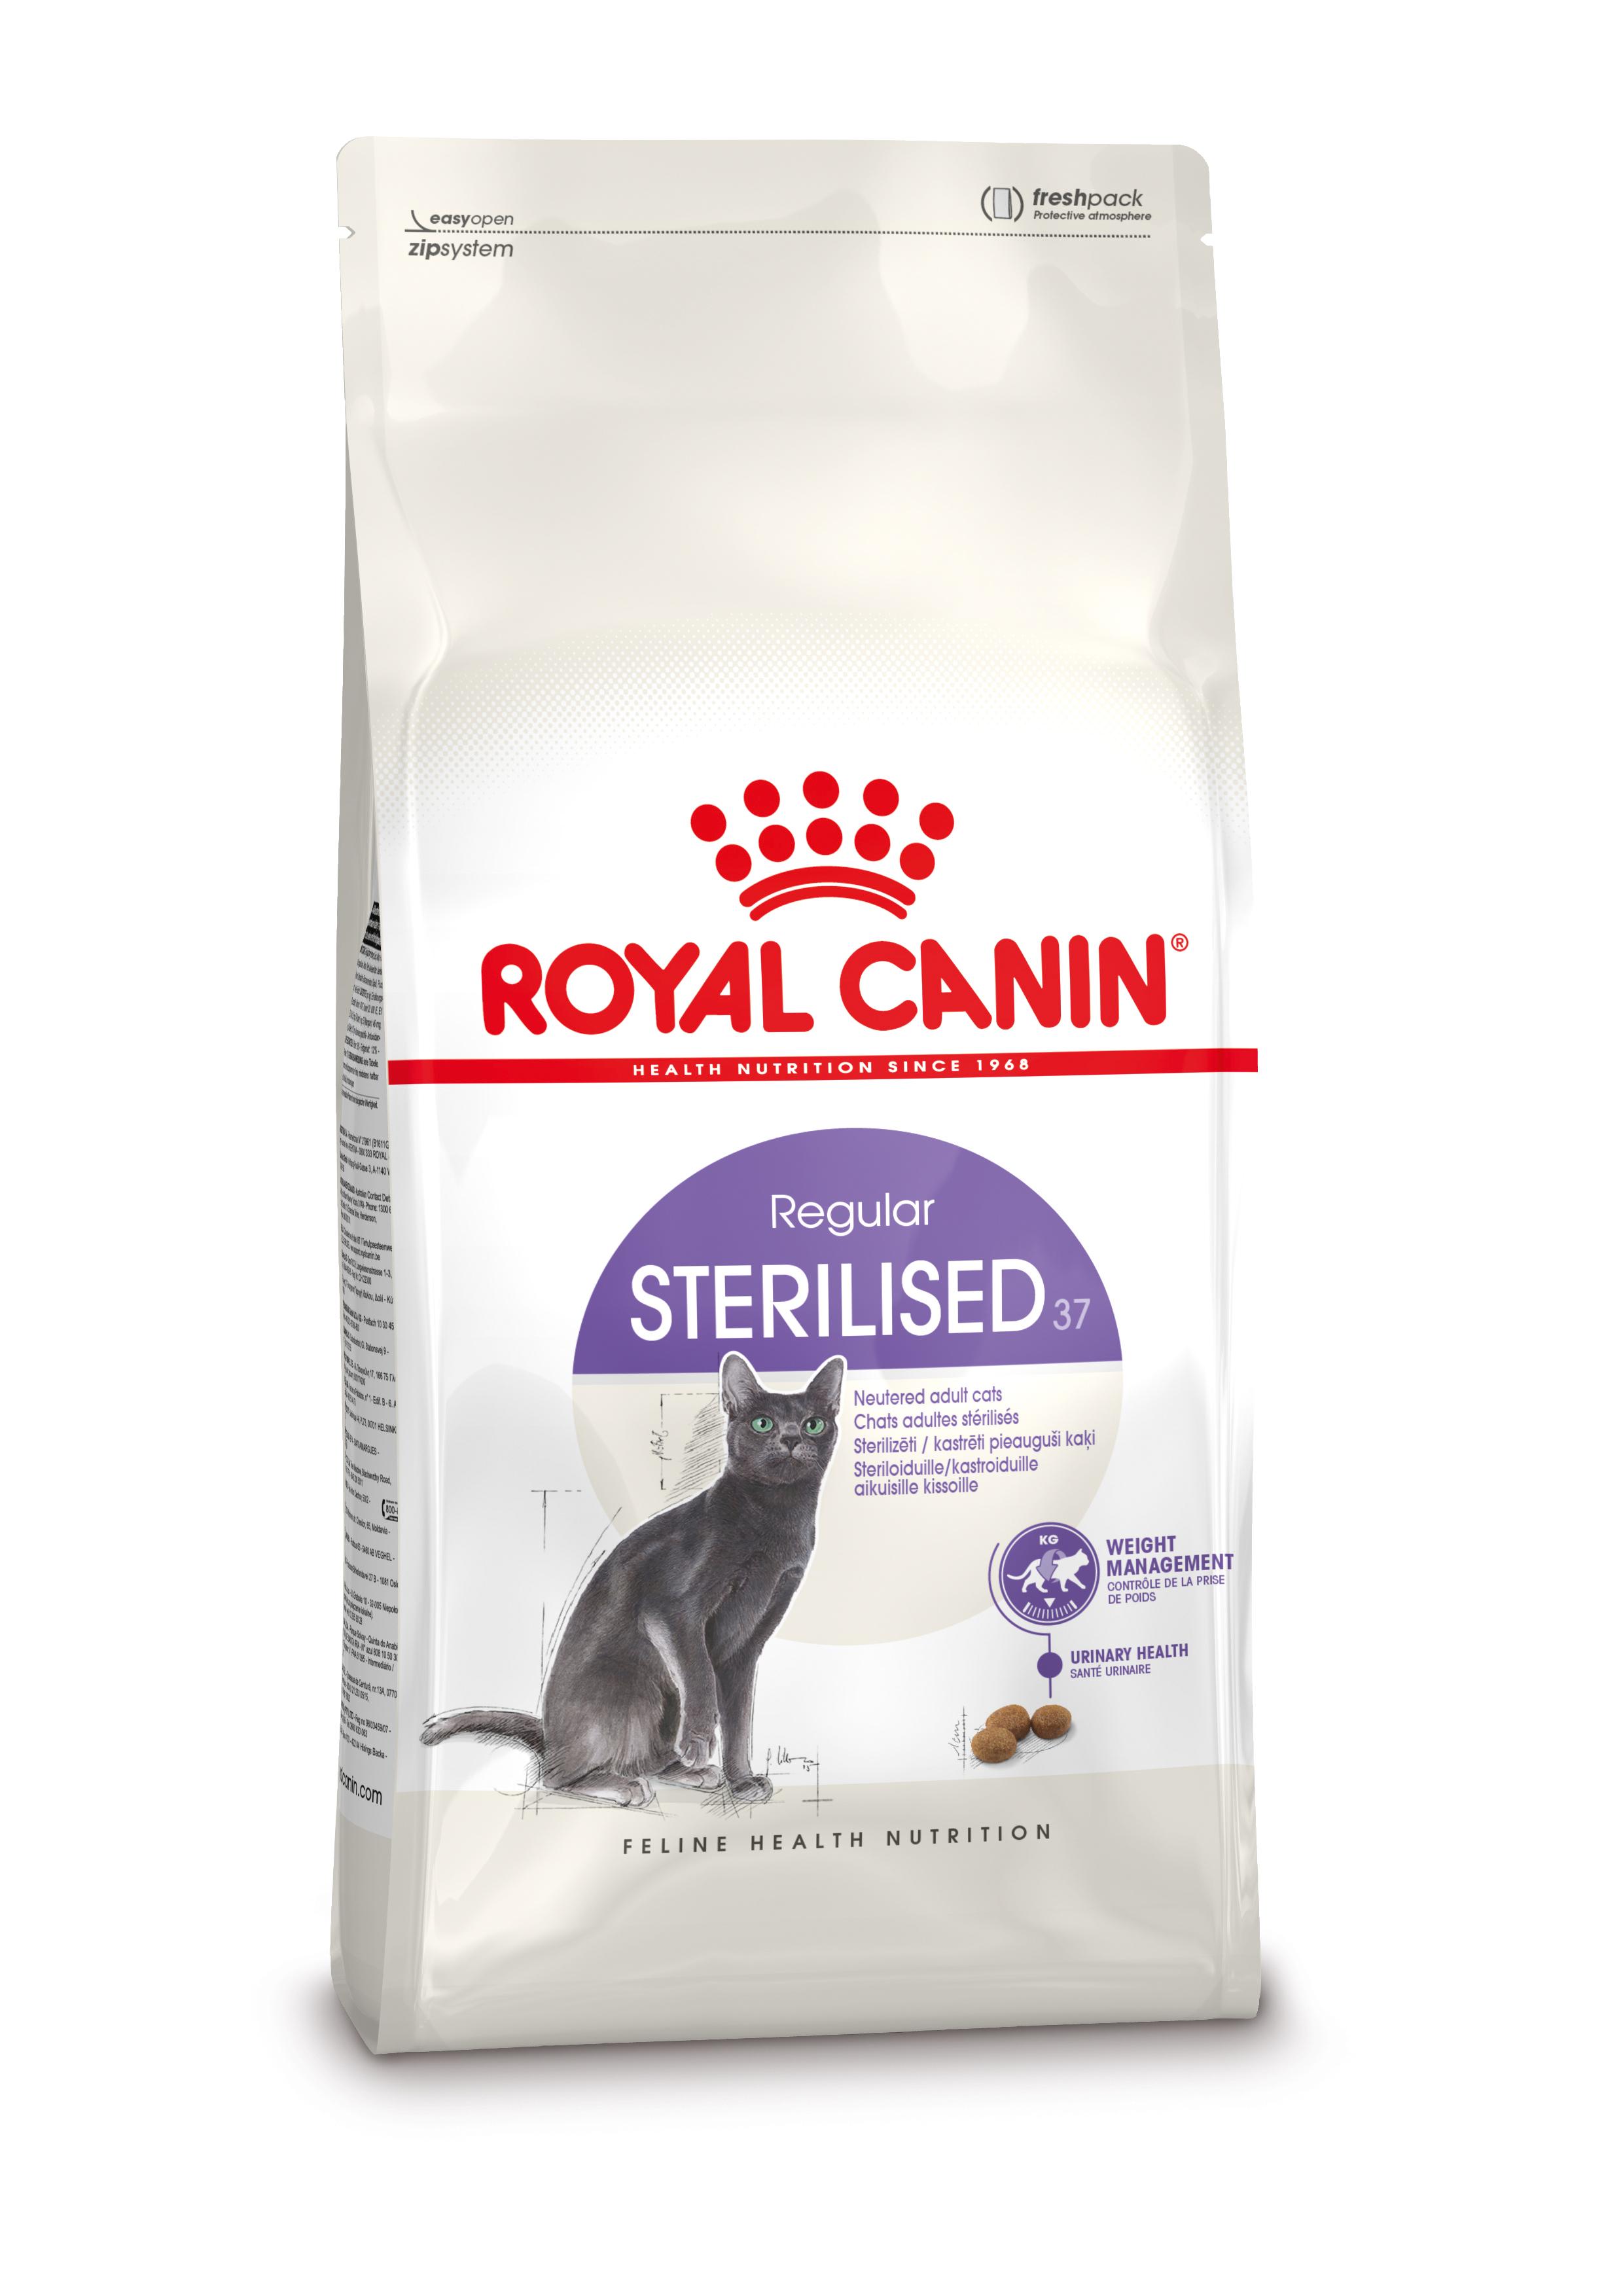 Afbeelding Royal Canin Sterilised 37 kattenvoer 4 kg door Brekz.nl